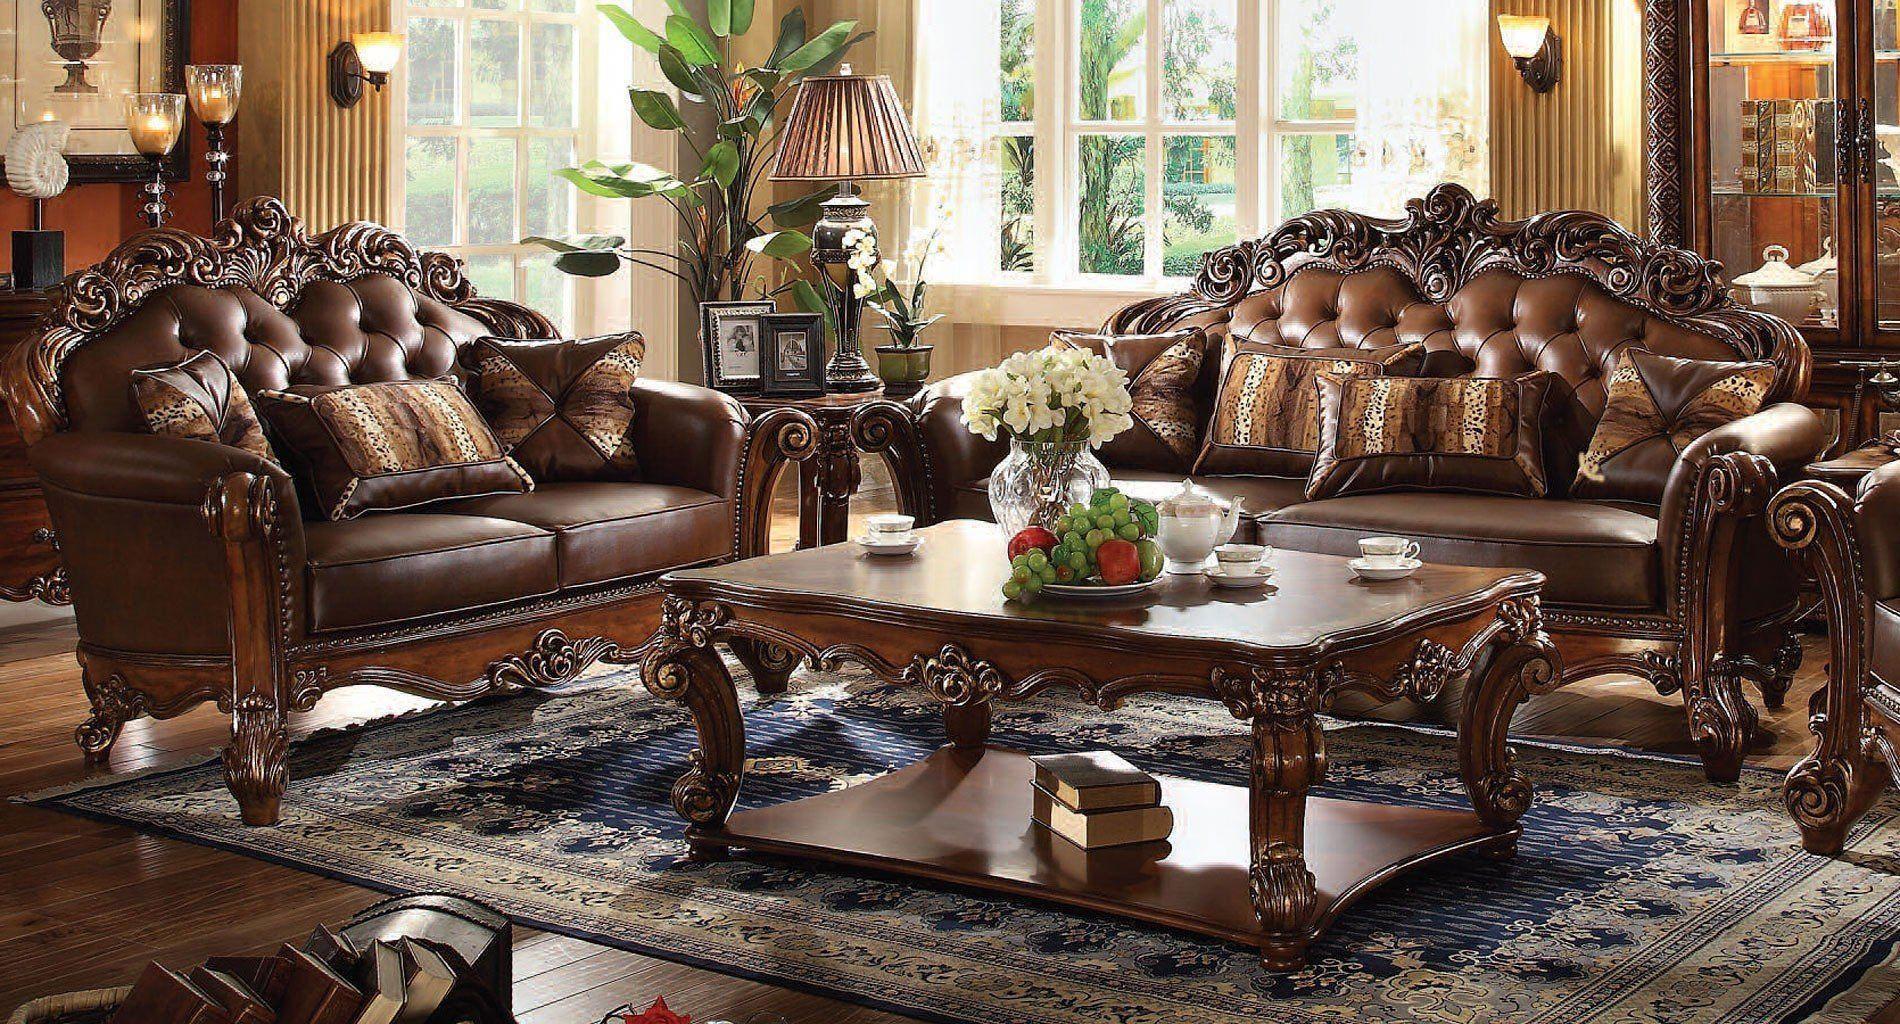 Vendome Living Room Set w Large Sofa Livingroomideas Living room